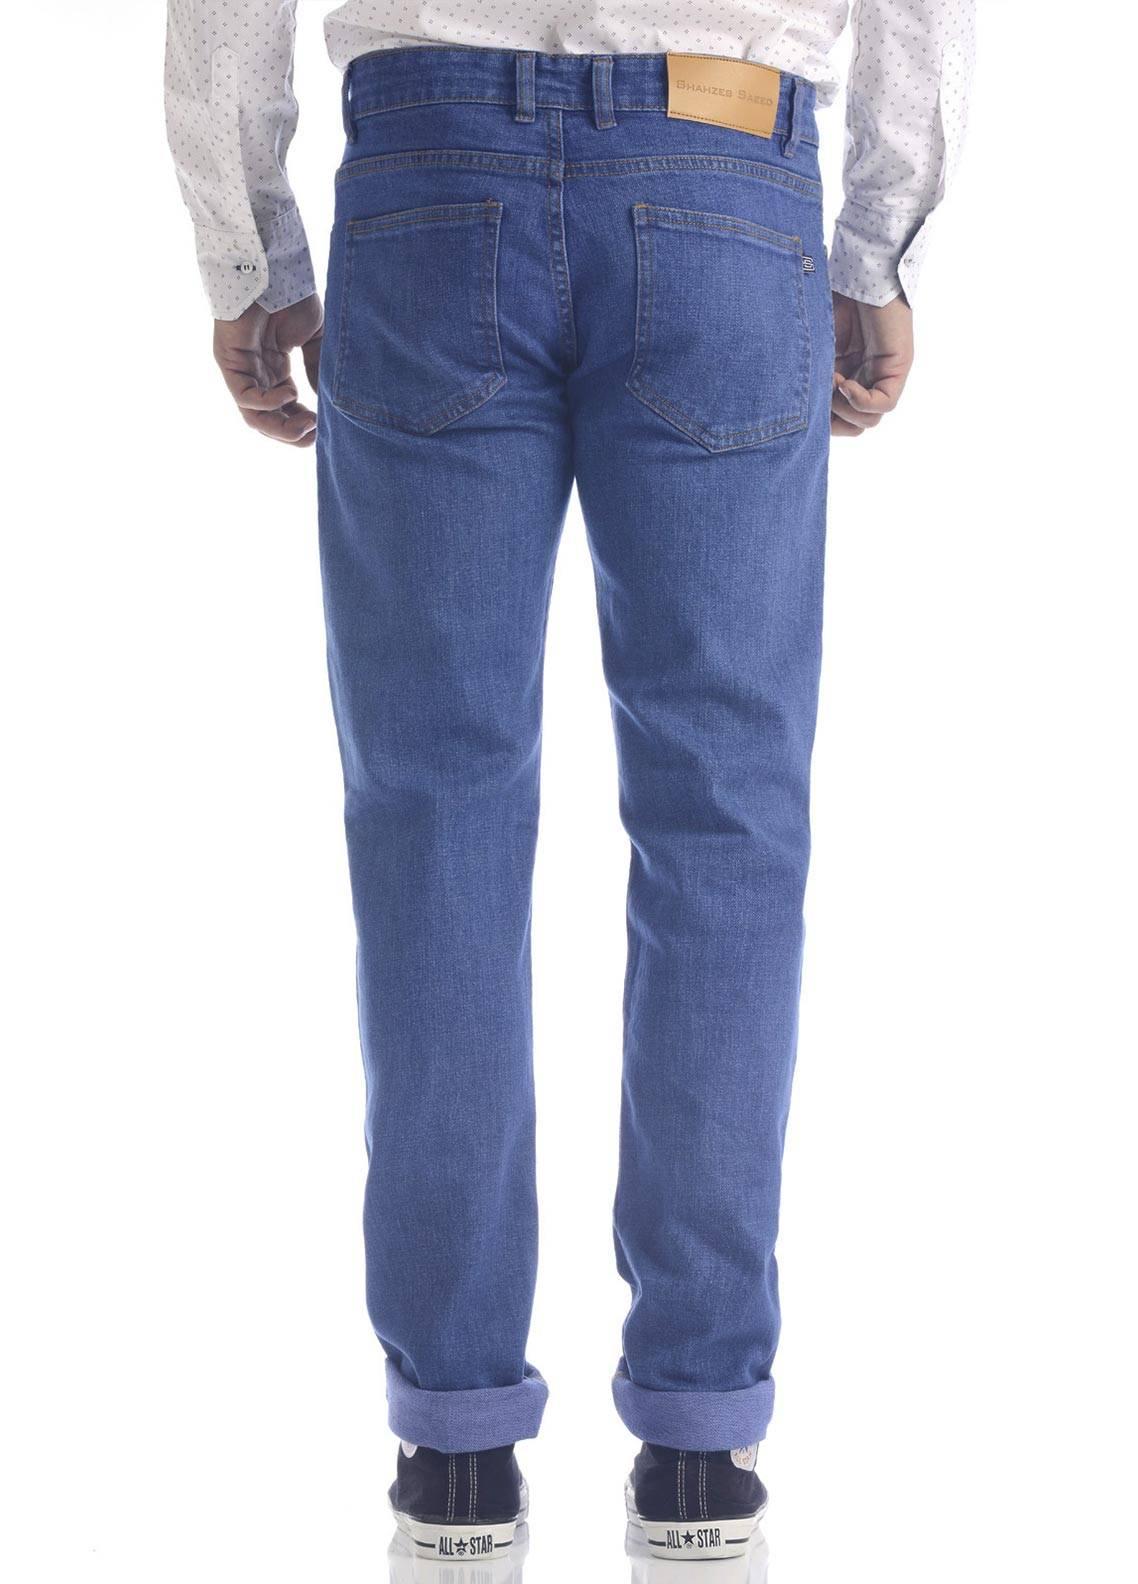 Shahzeb Saeed Denim Casual Jeans for Men - Royal Blue DNM-94